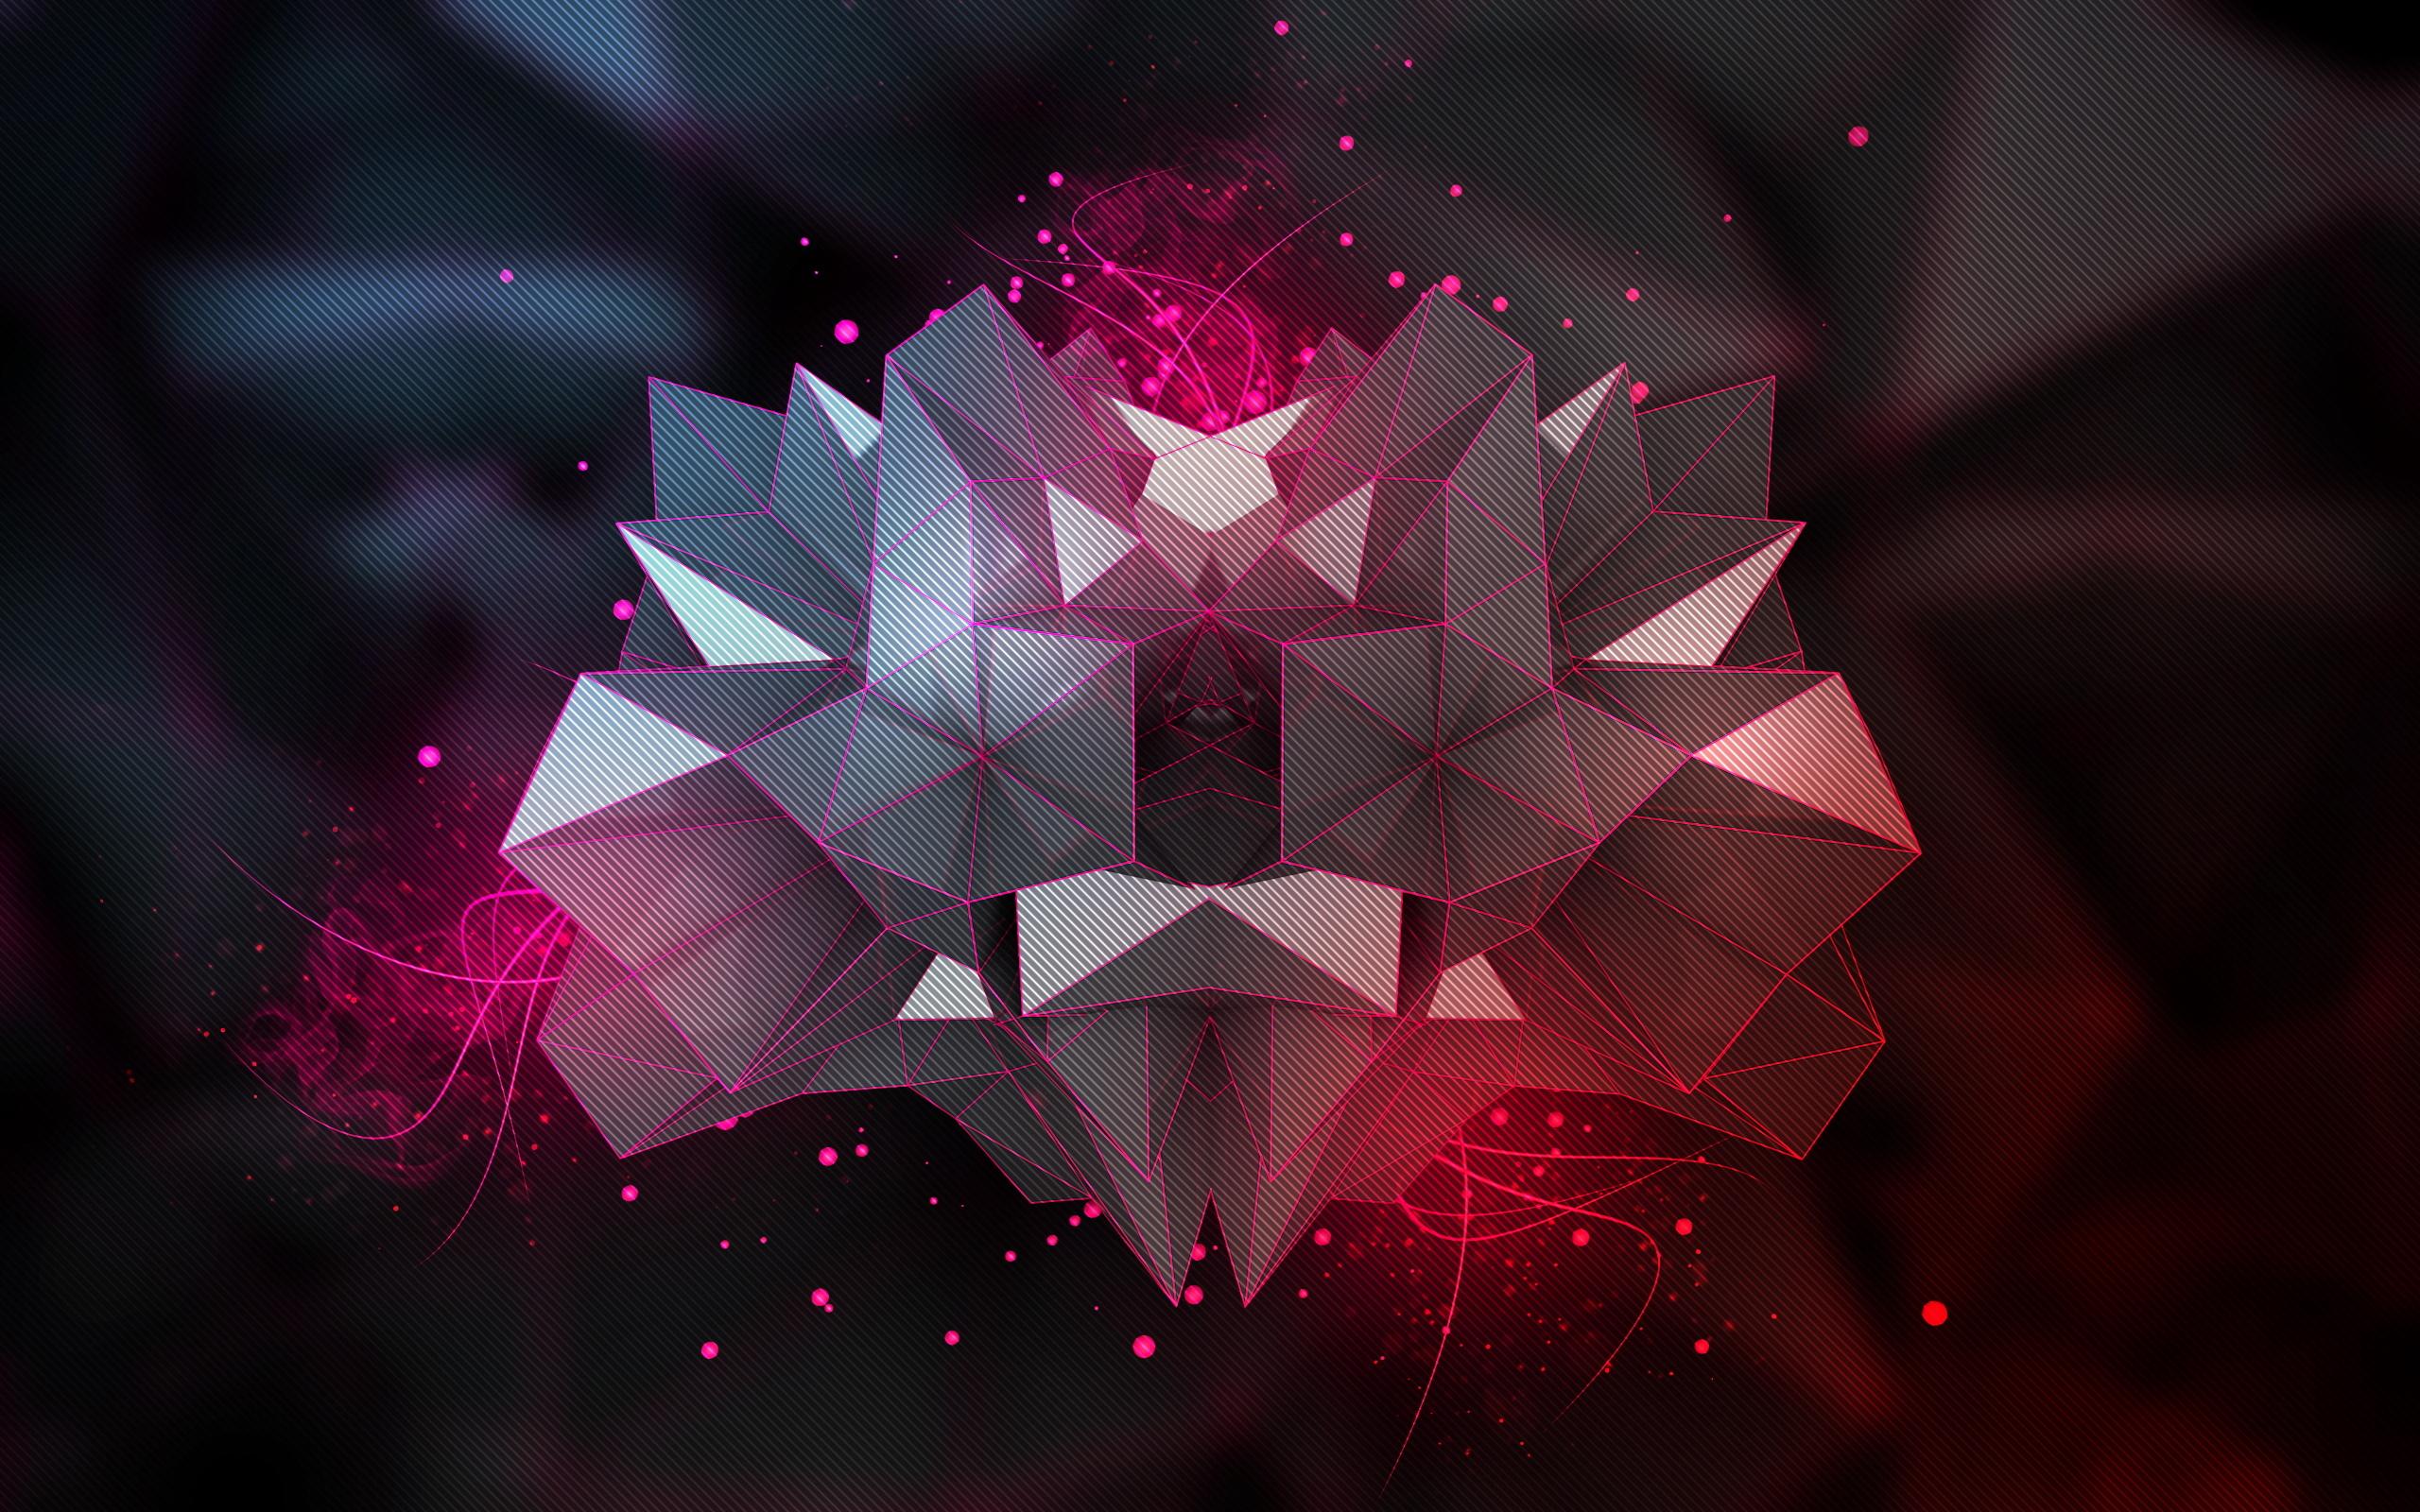 triangles 3d background hd wallpaper 2560x1600